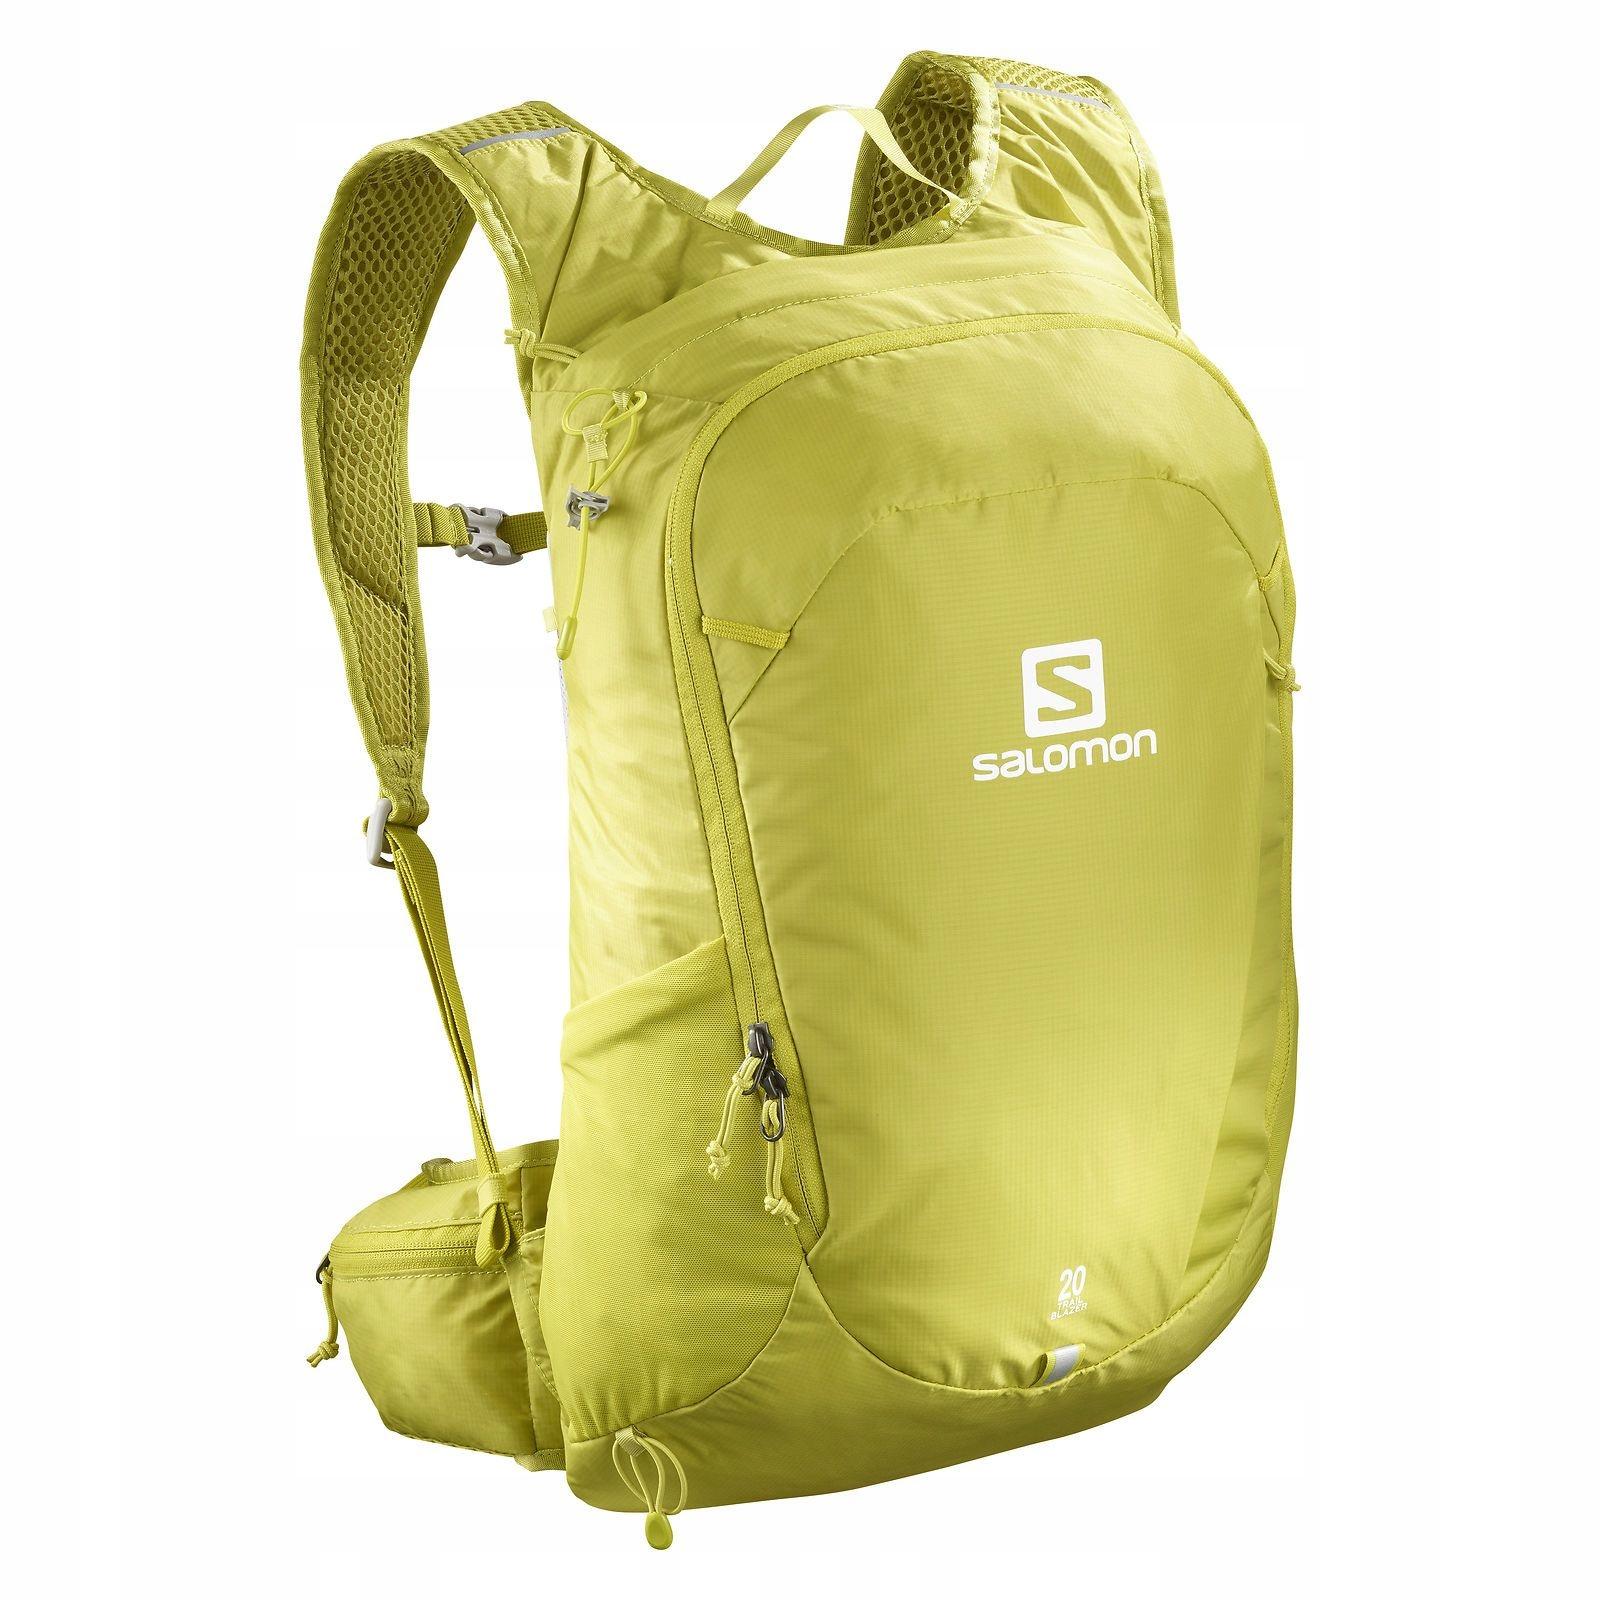 Plecak Turystyczny Salomon Trailblazer 20